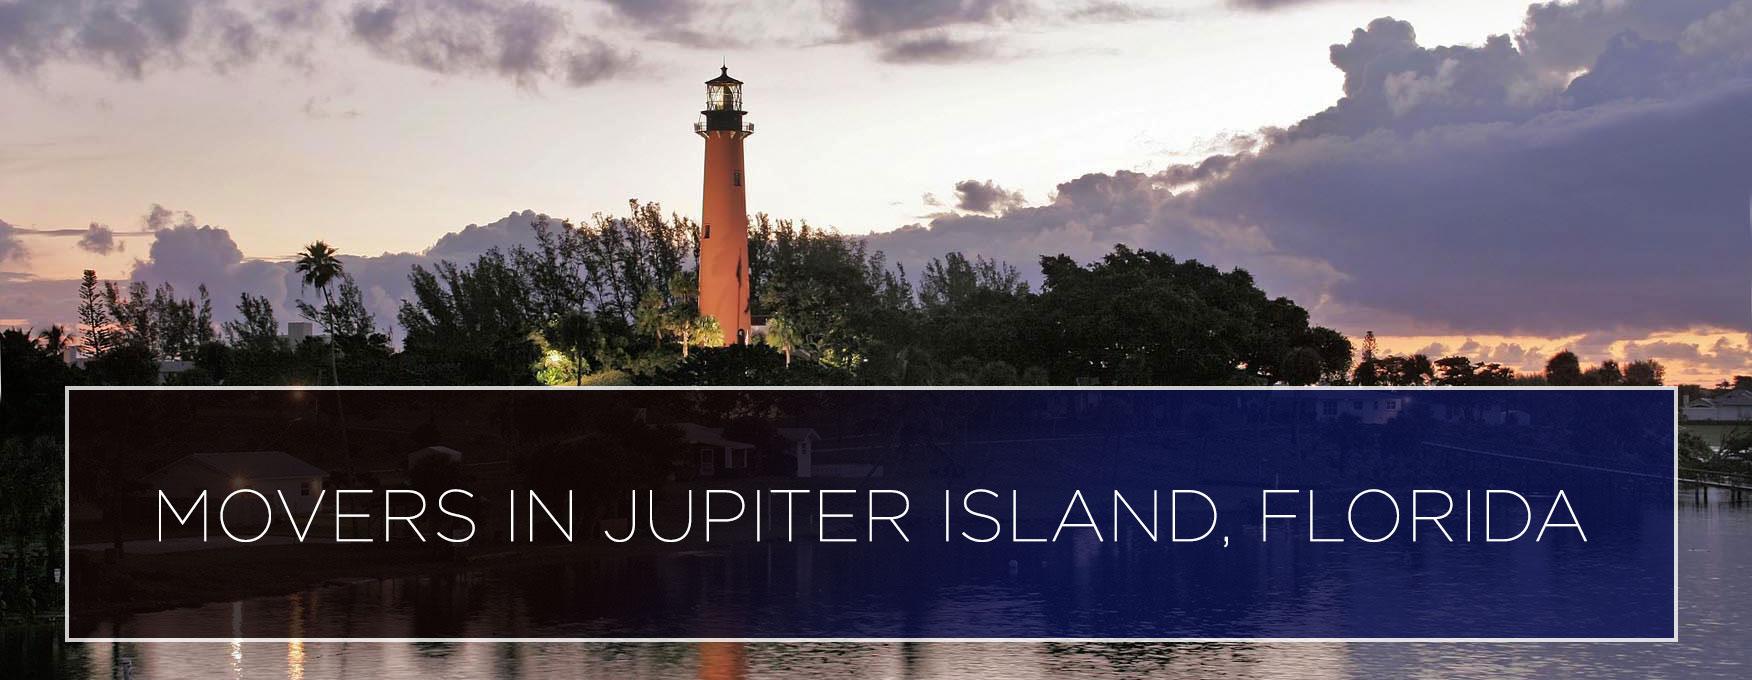 jupiter lighthouse with movers in jupiter island, florida caption